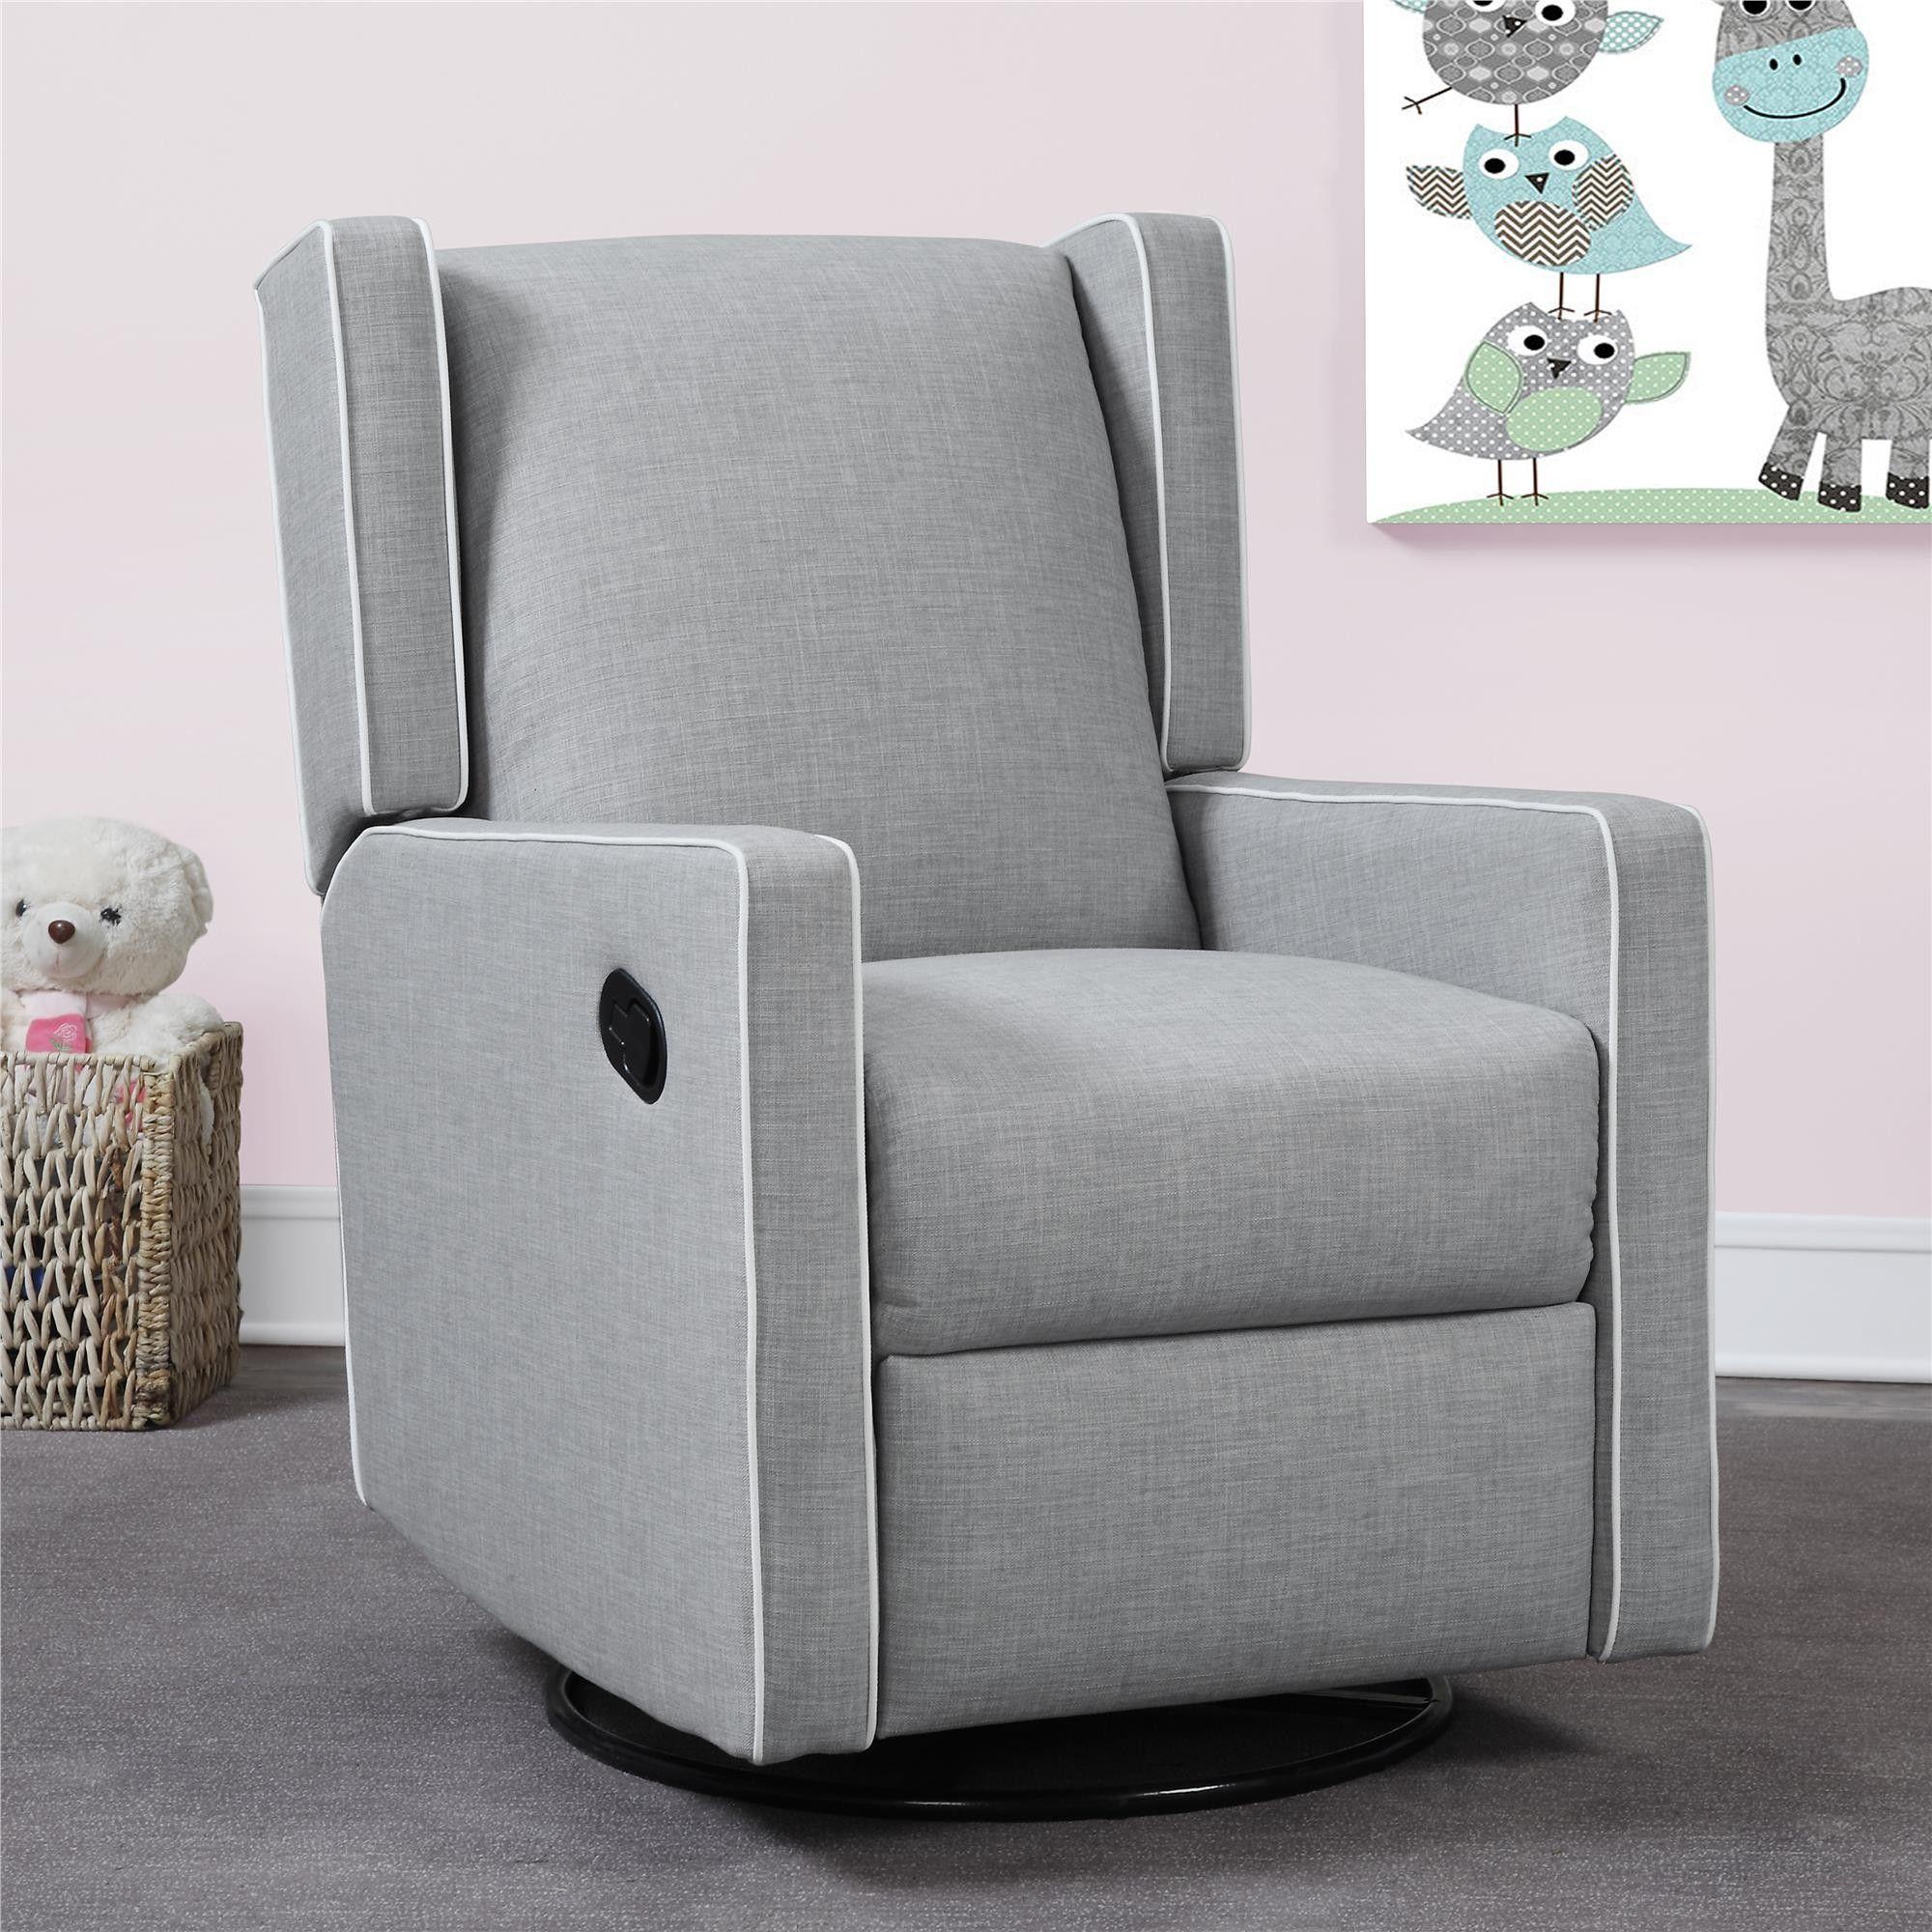 Beautiful Grey Nursery Chair